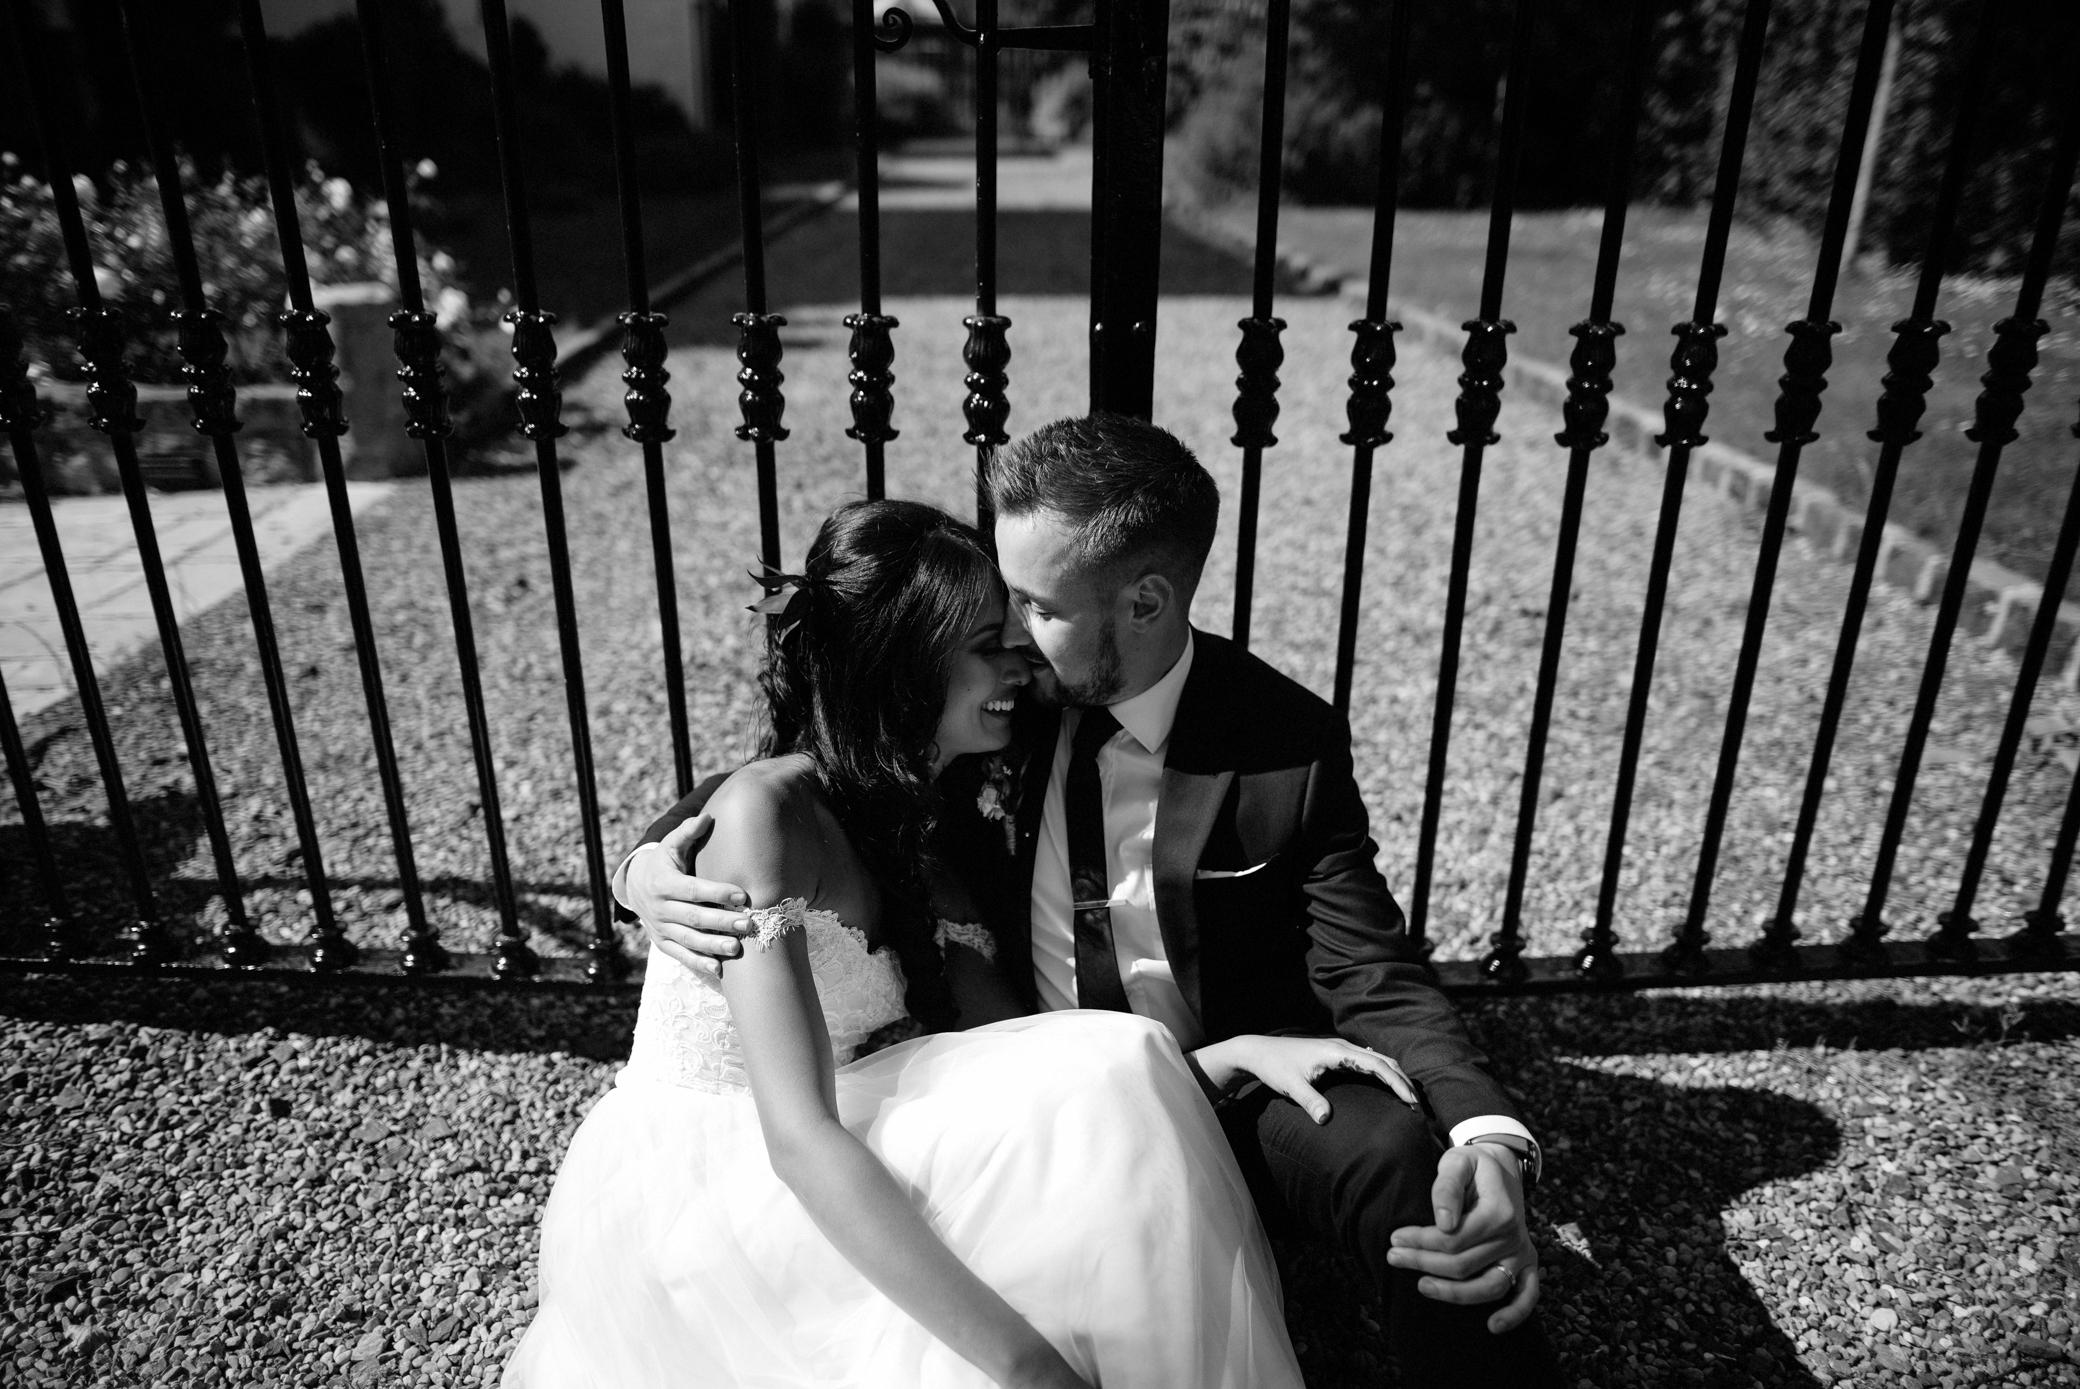 Alan&Naz- Barberstown Castle Wedding - Wedding photographer Ireland-141.jpg